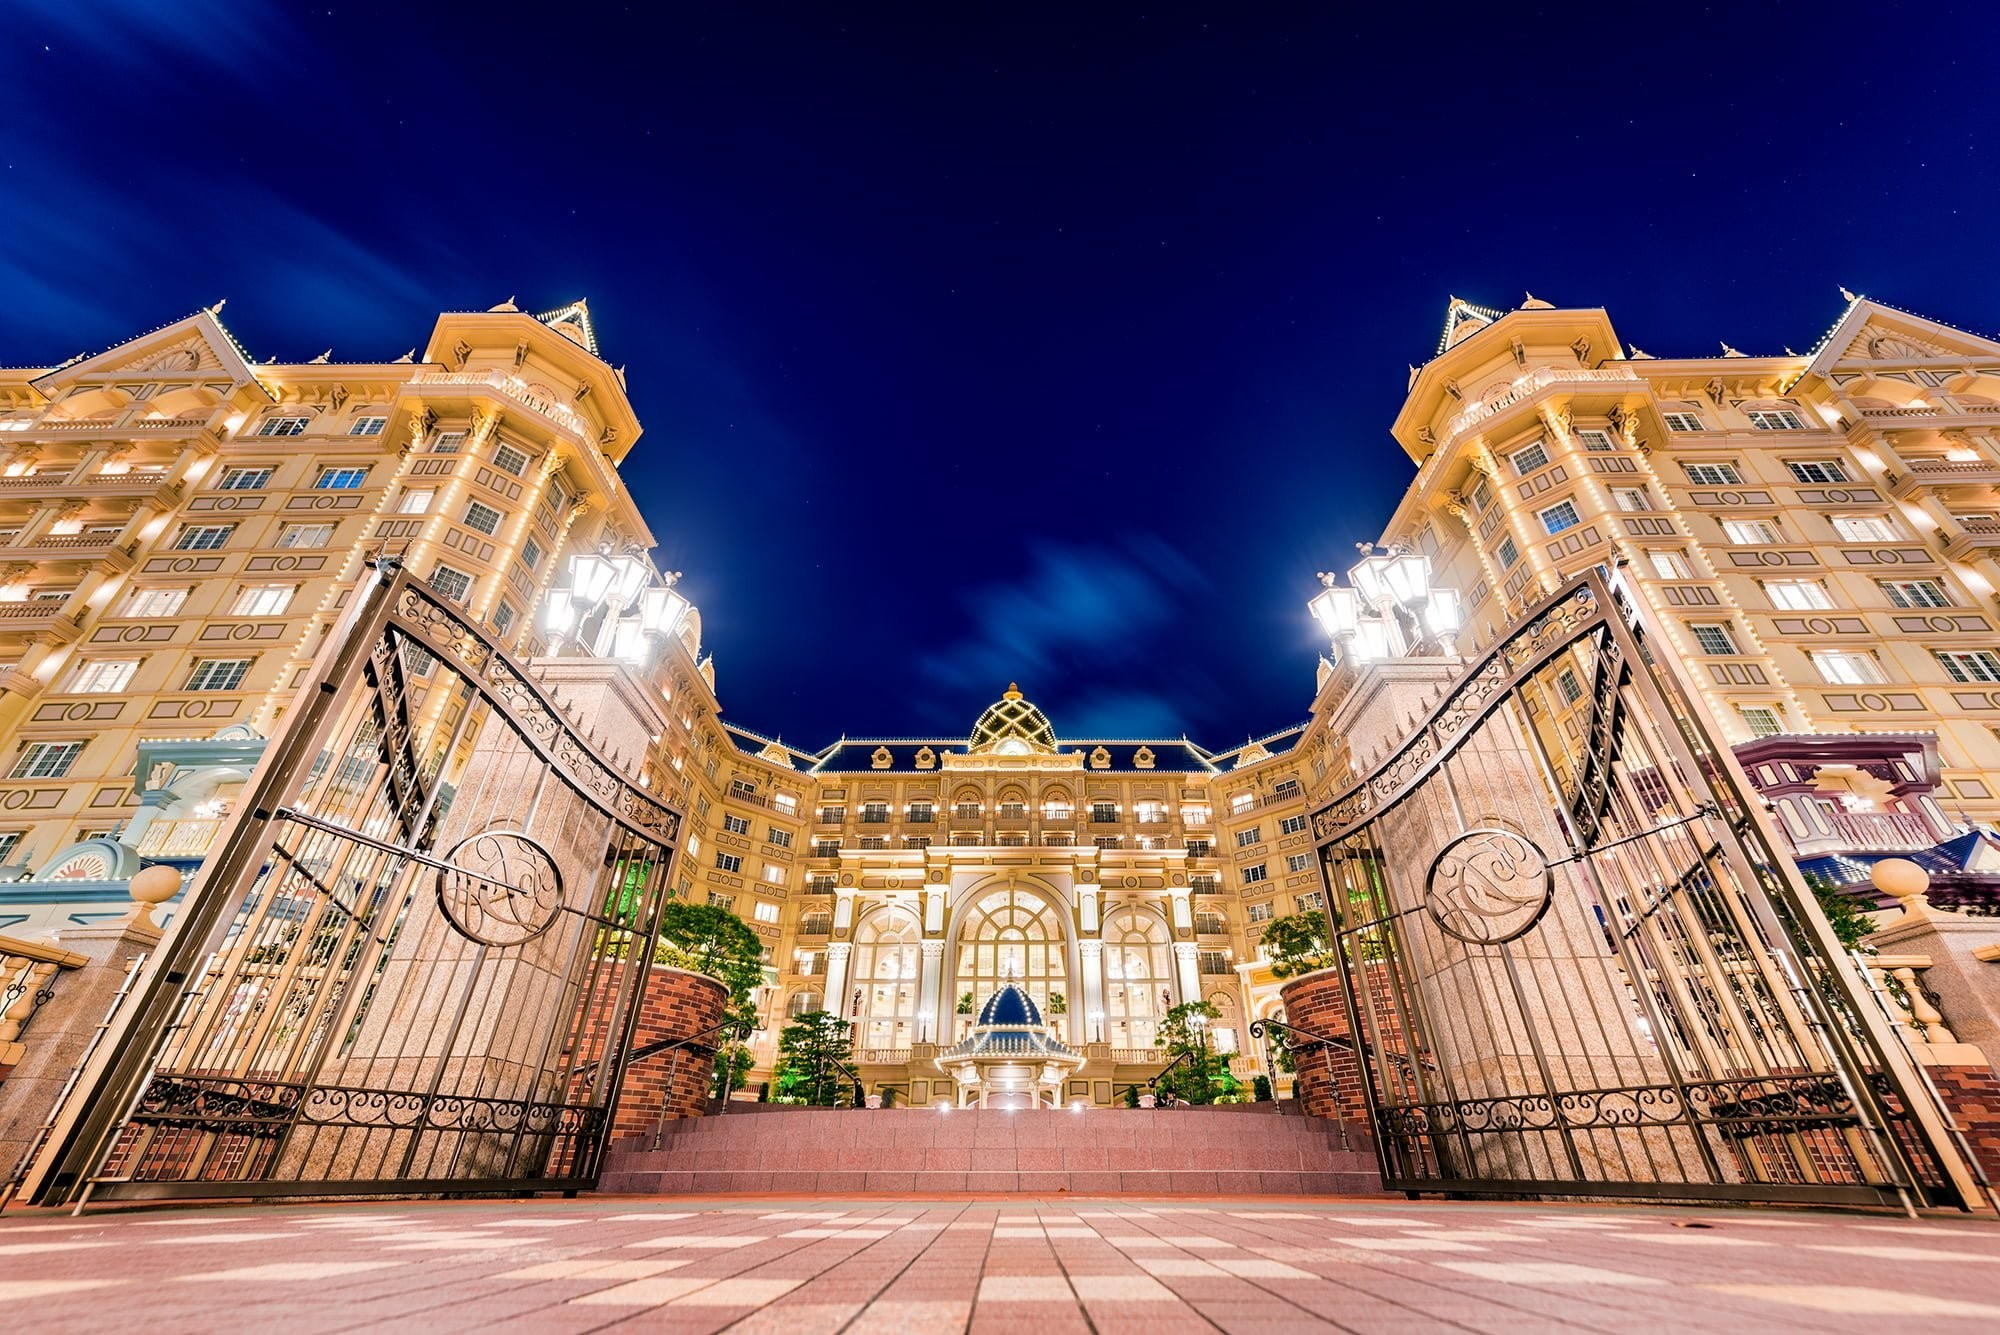 Best Hotel Near tokyo Station Elegant Hotel Reviews & Rankings at tokyo Disneyland Disney tourist Blog